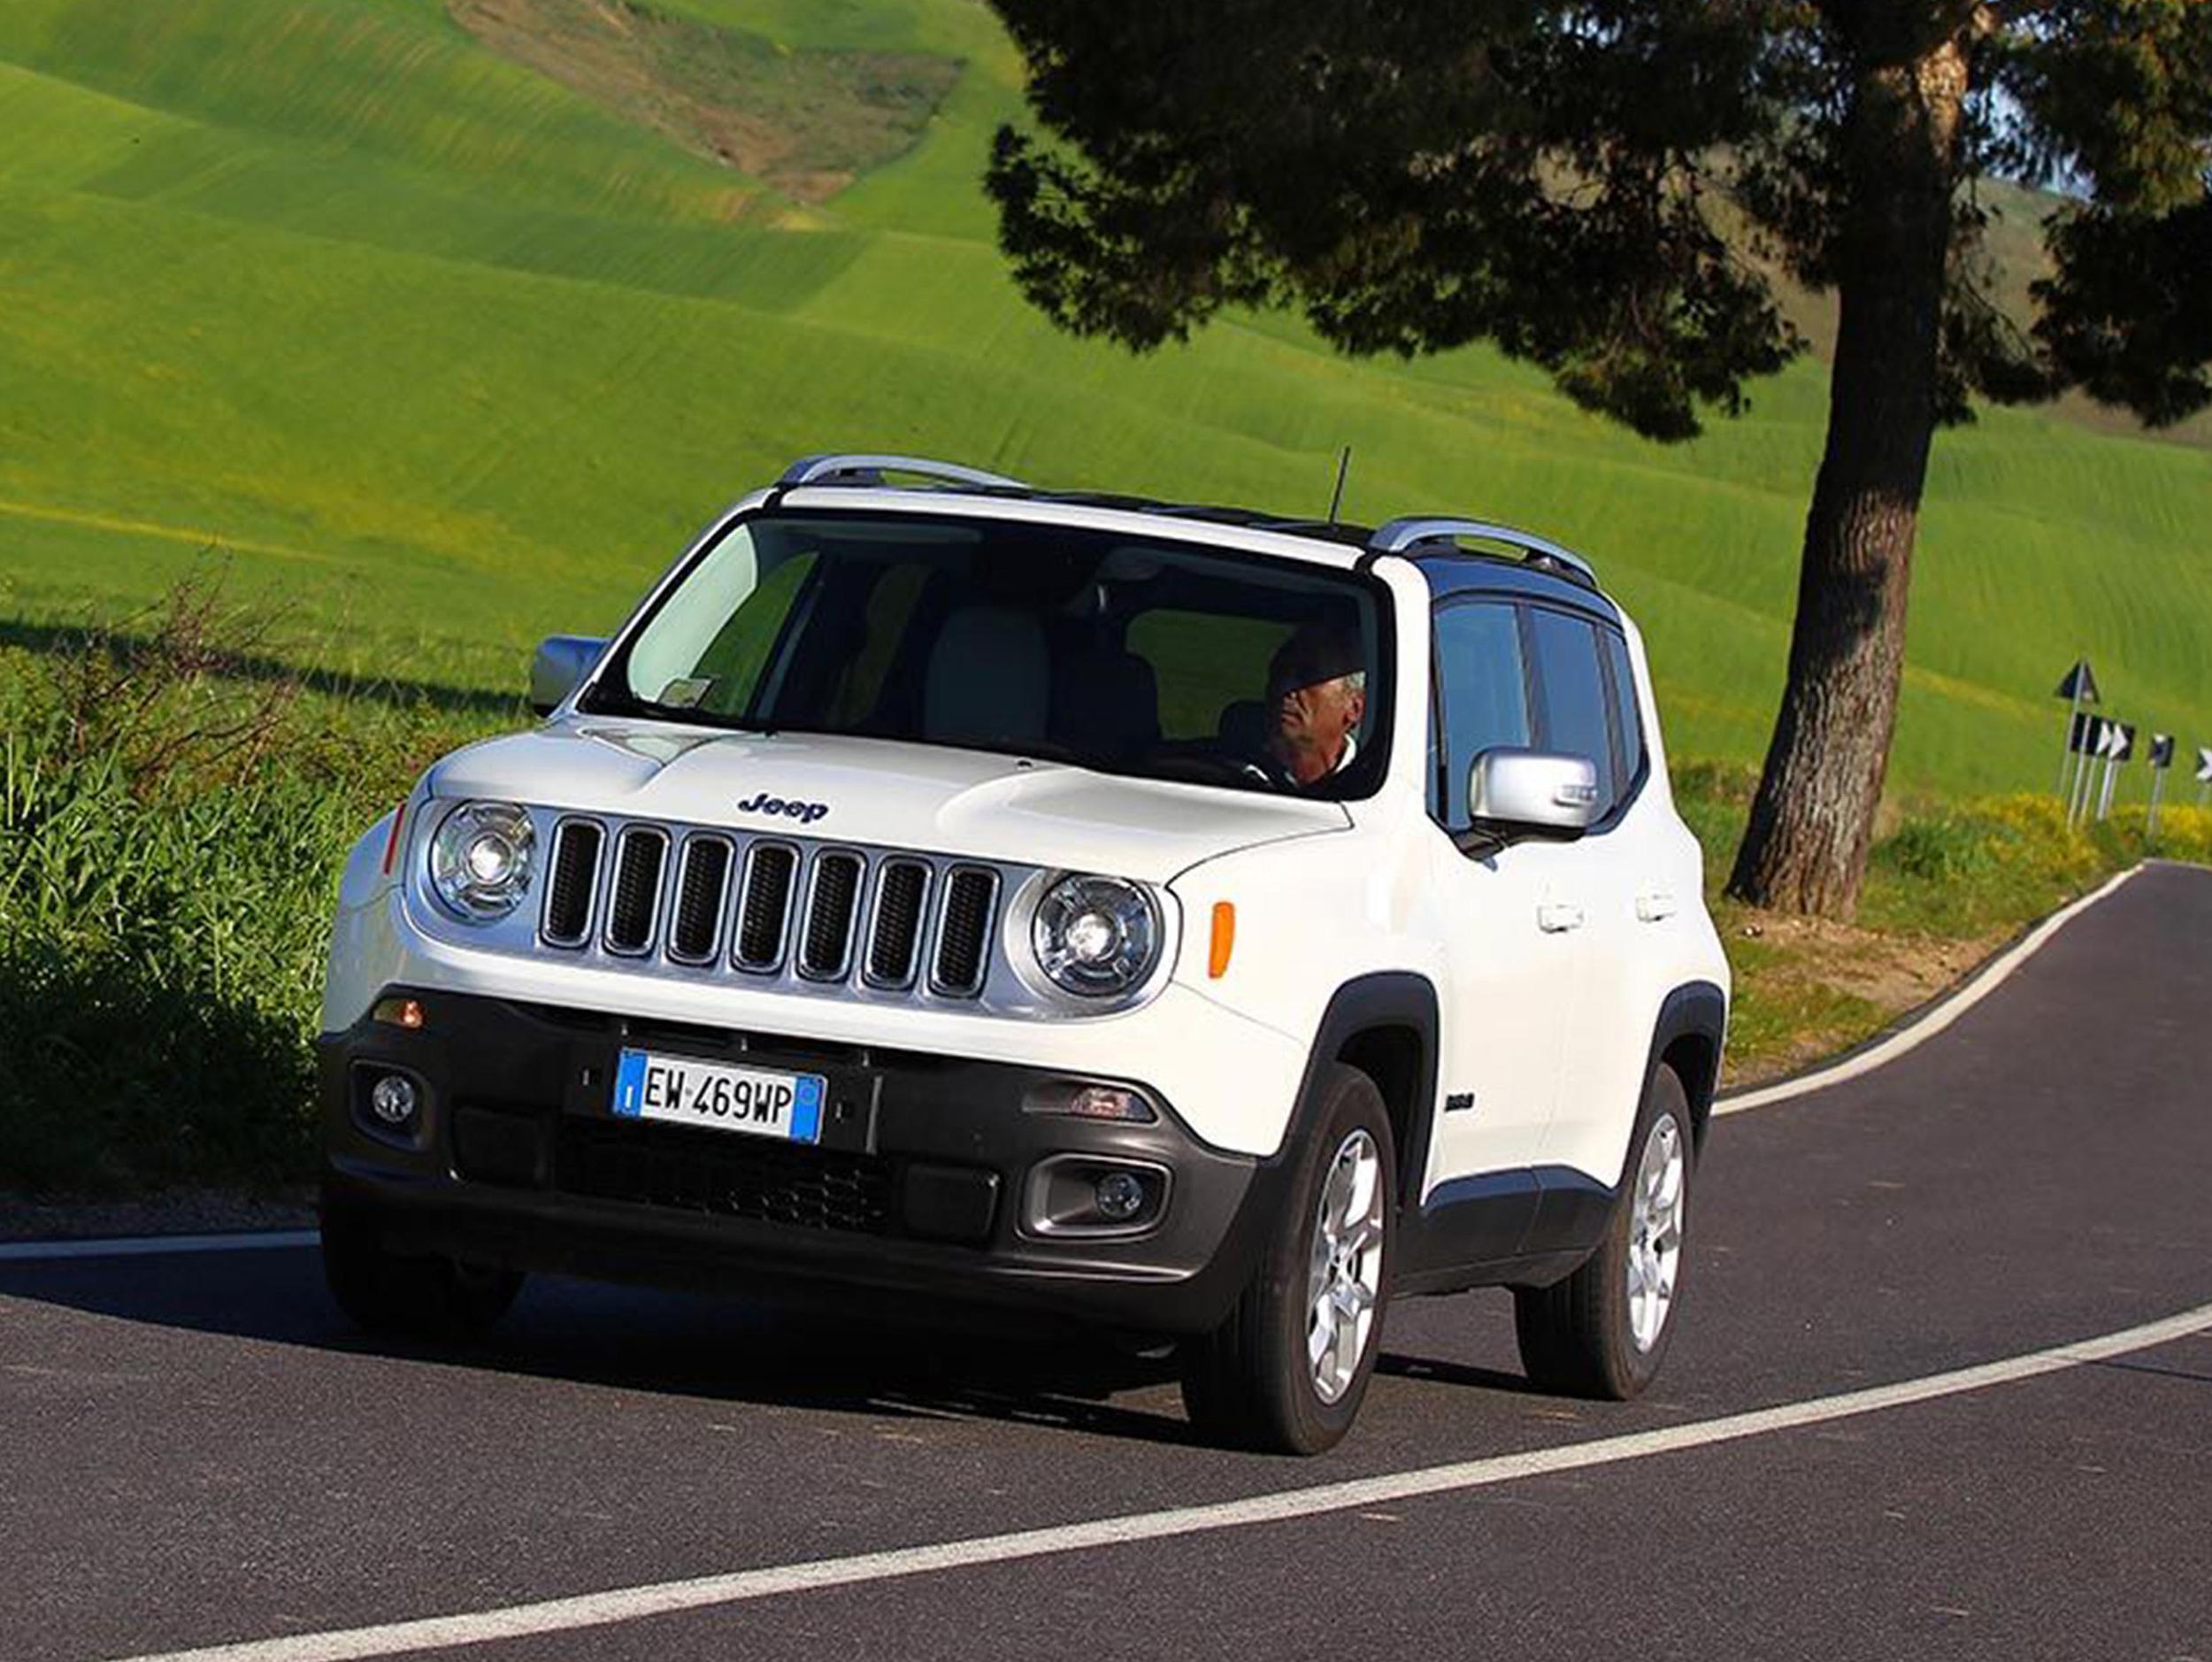 Fiat-Chrysler recalls 1.4 million cars over hacking scare